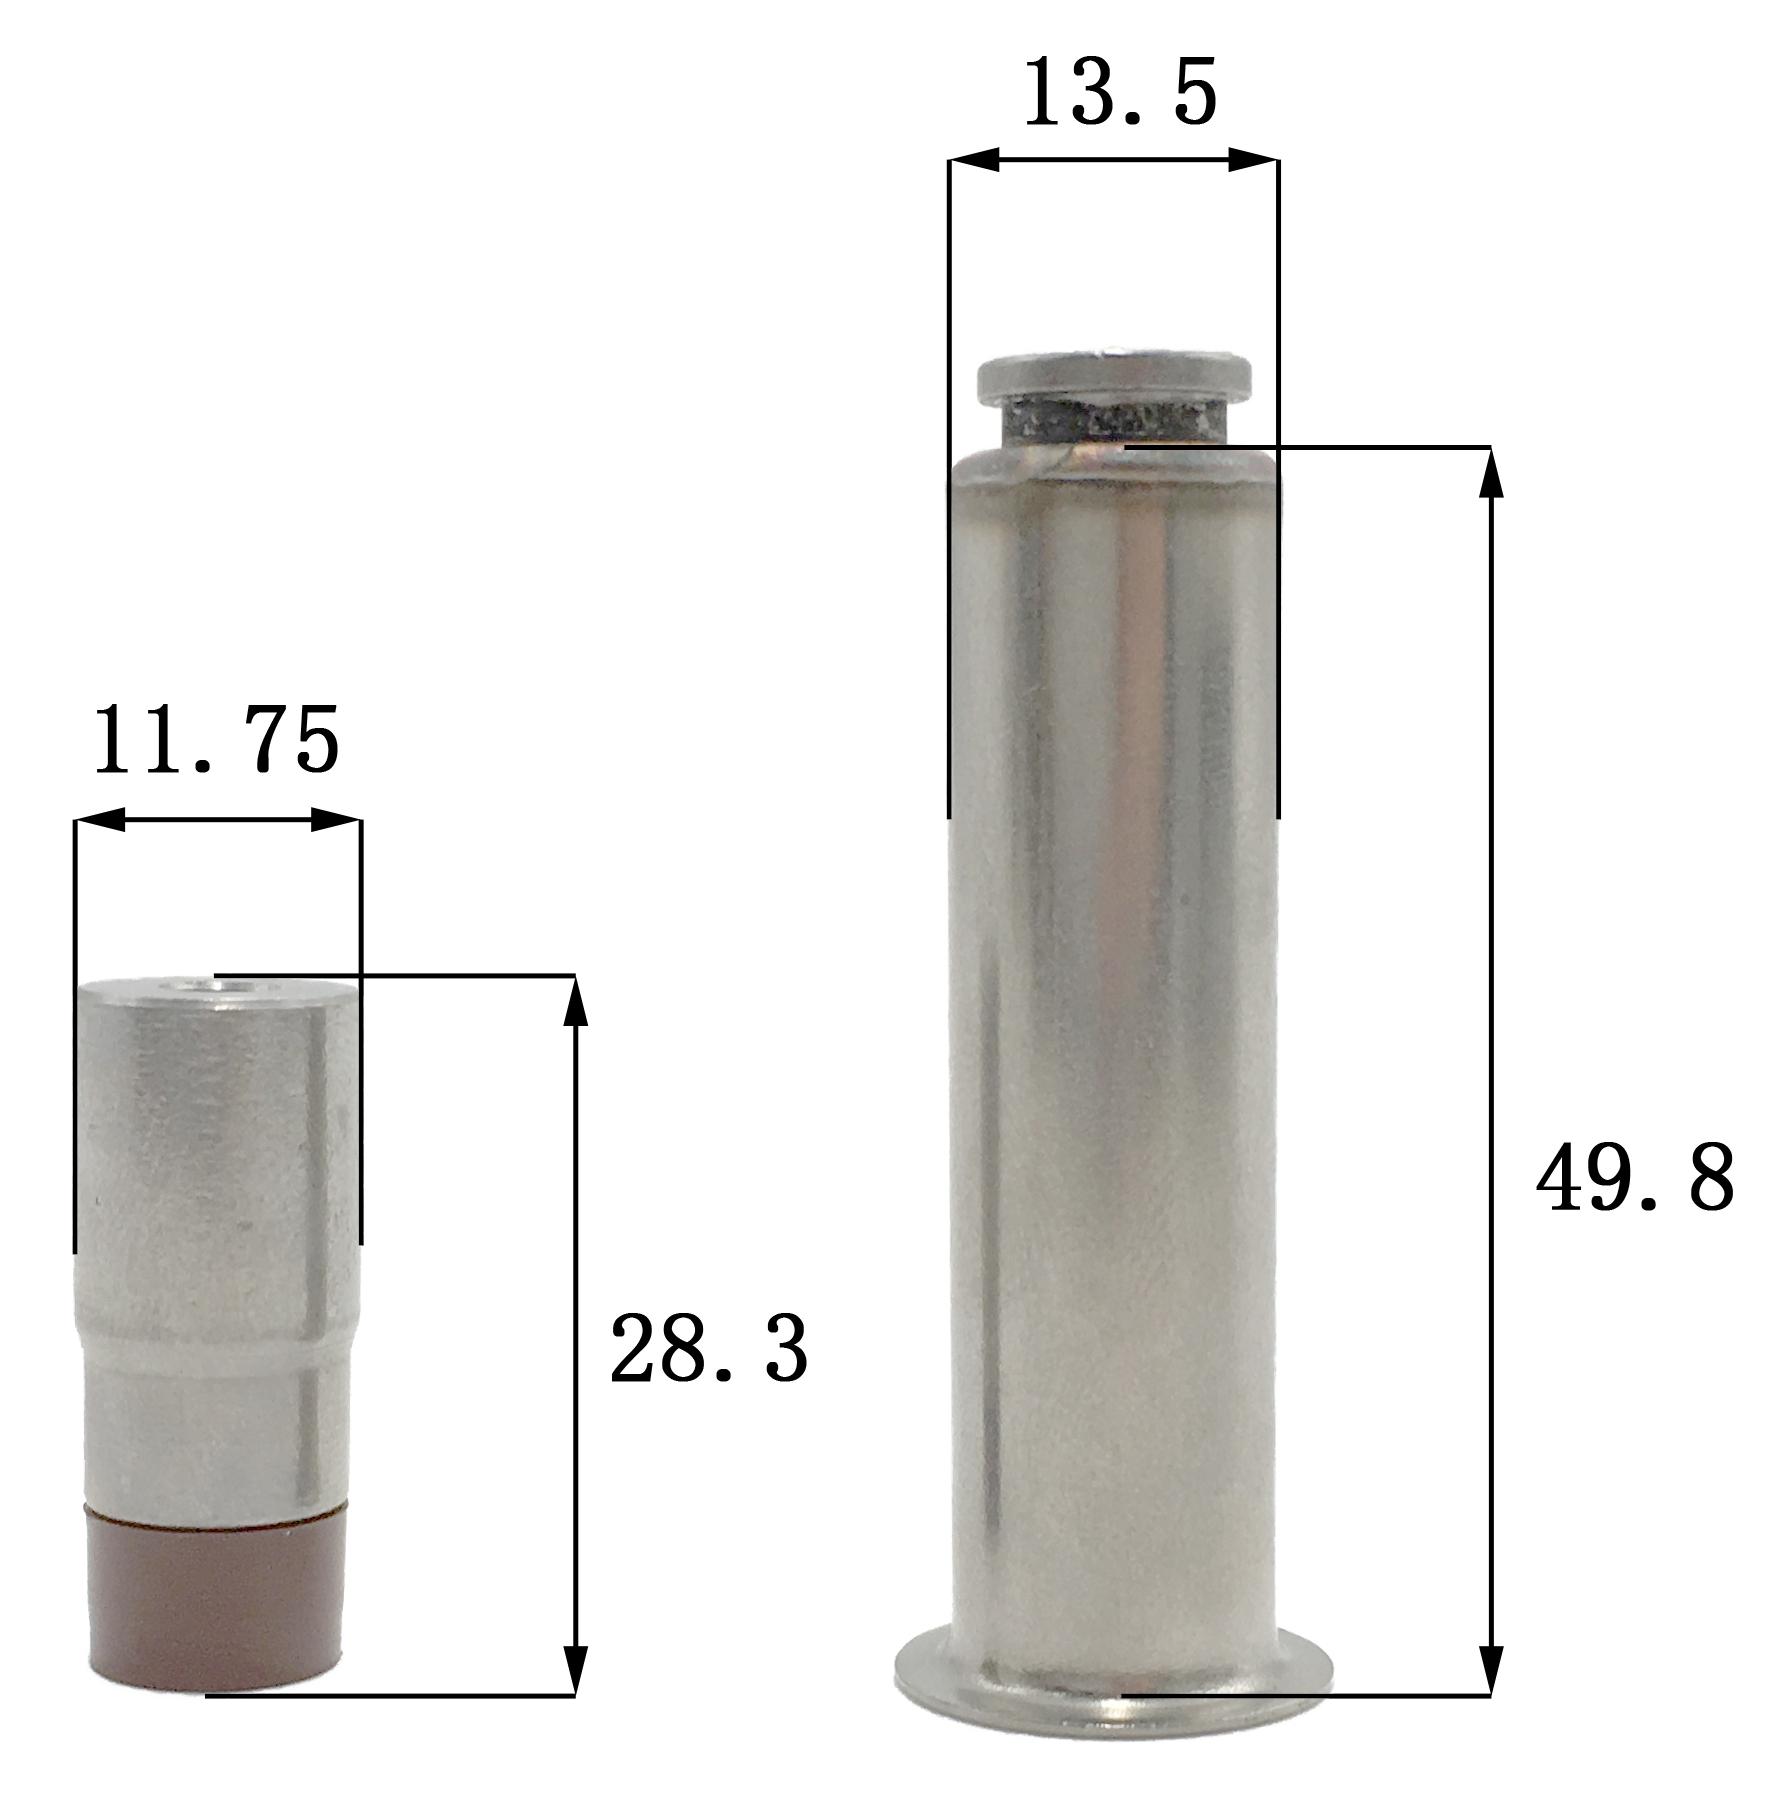 Dimension of BAPC213050375 Armature Assembly: